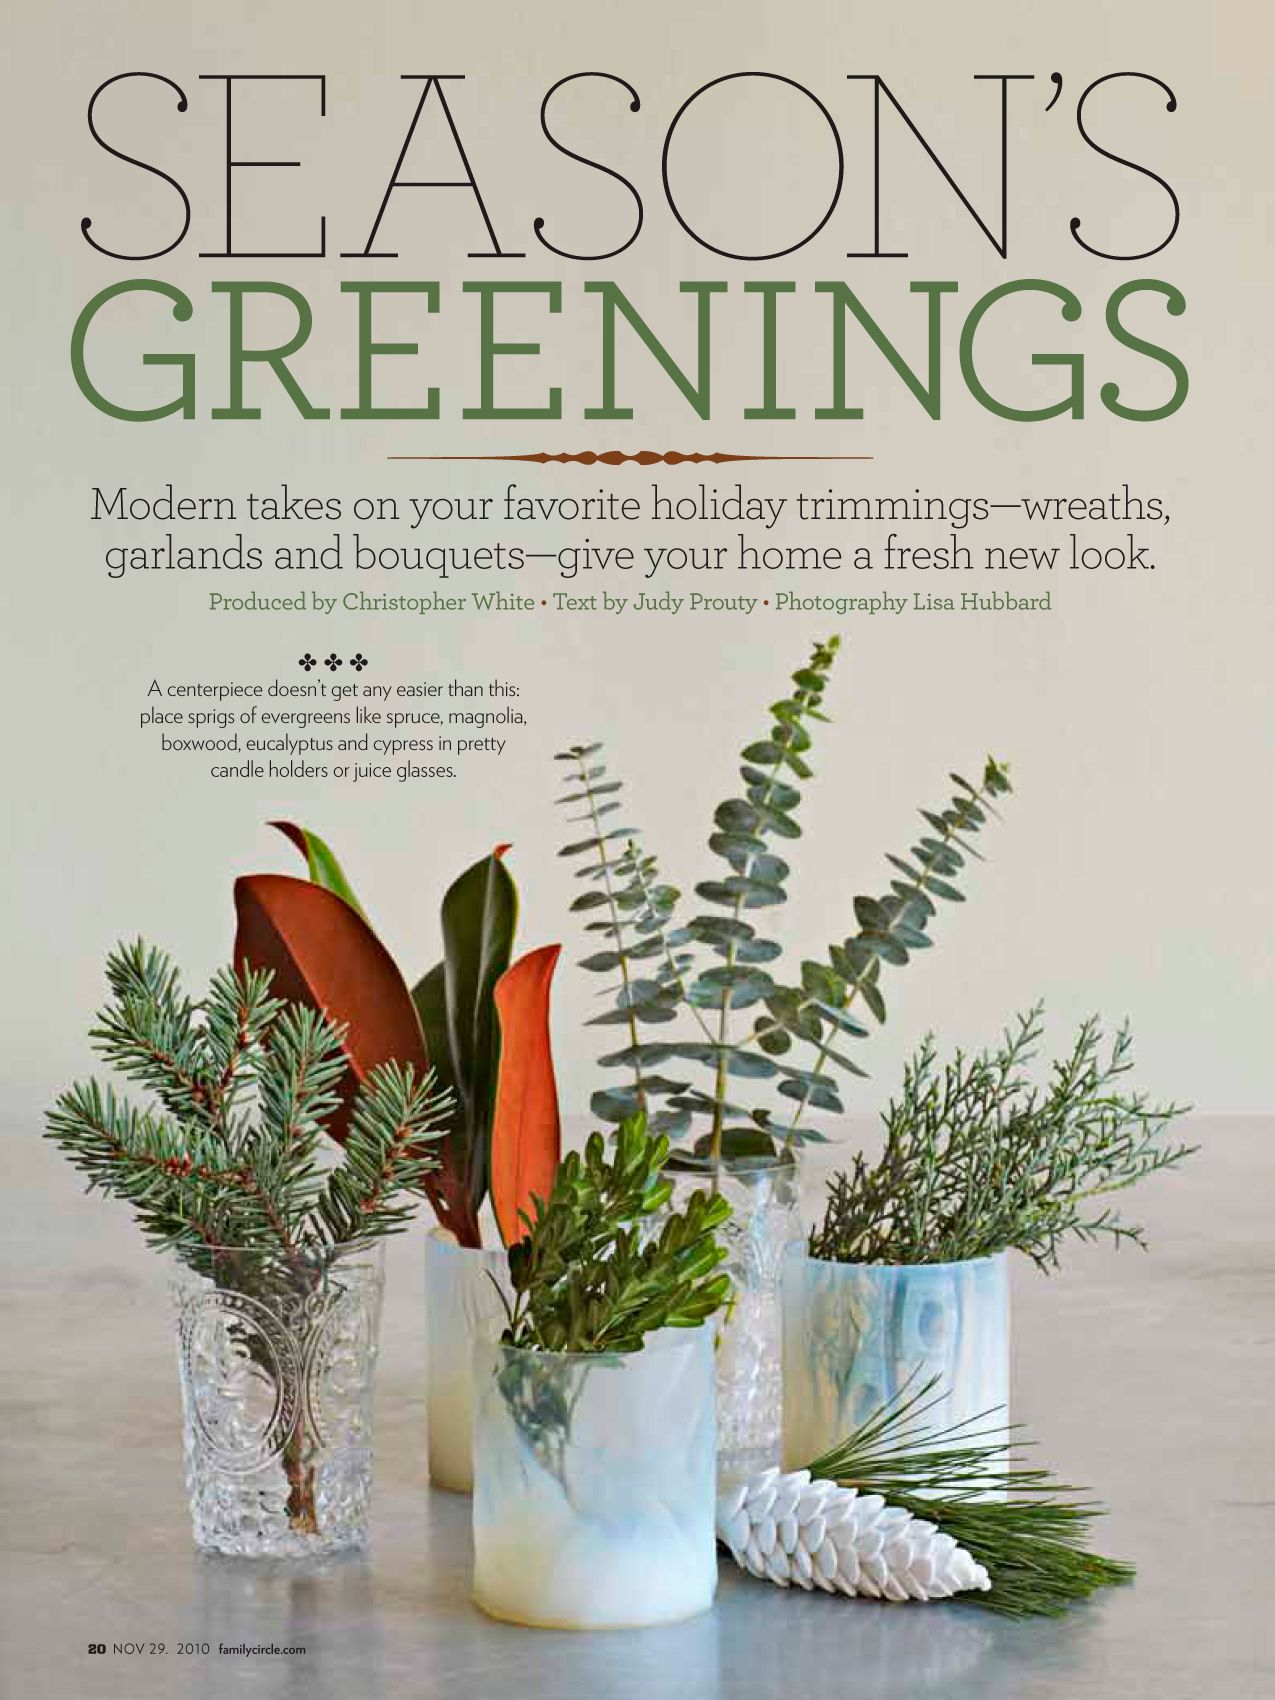 ChristopherWhite-FamilyCircle-Season's-Greenings-1.jpg